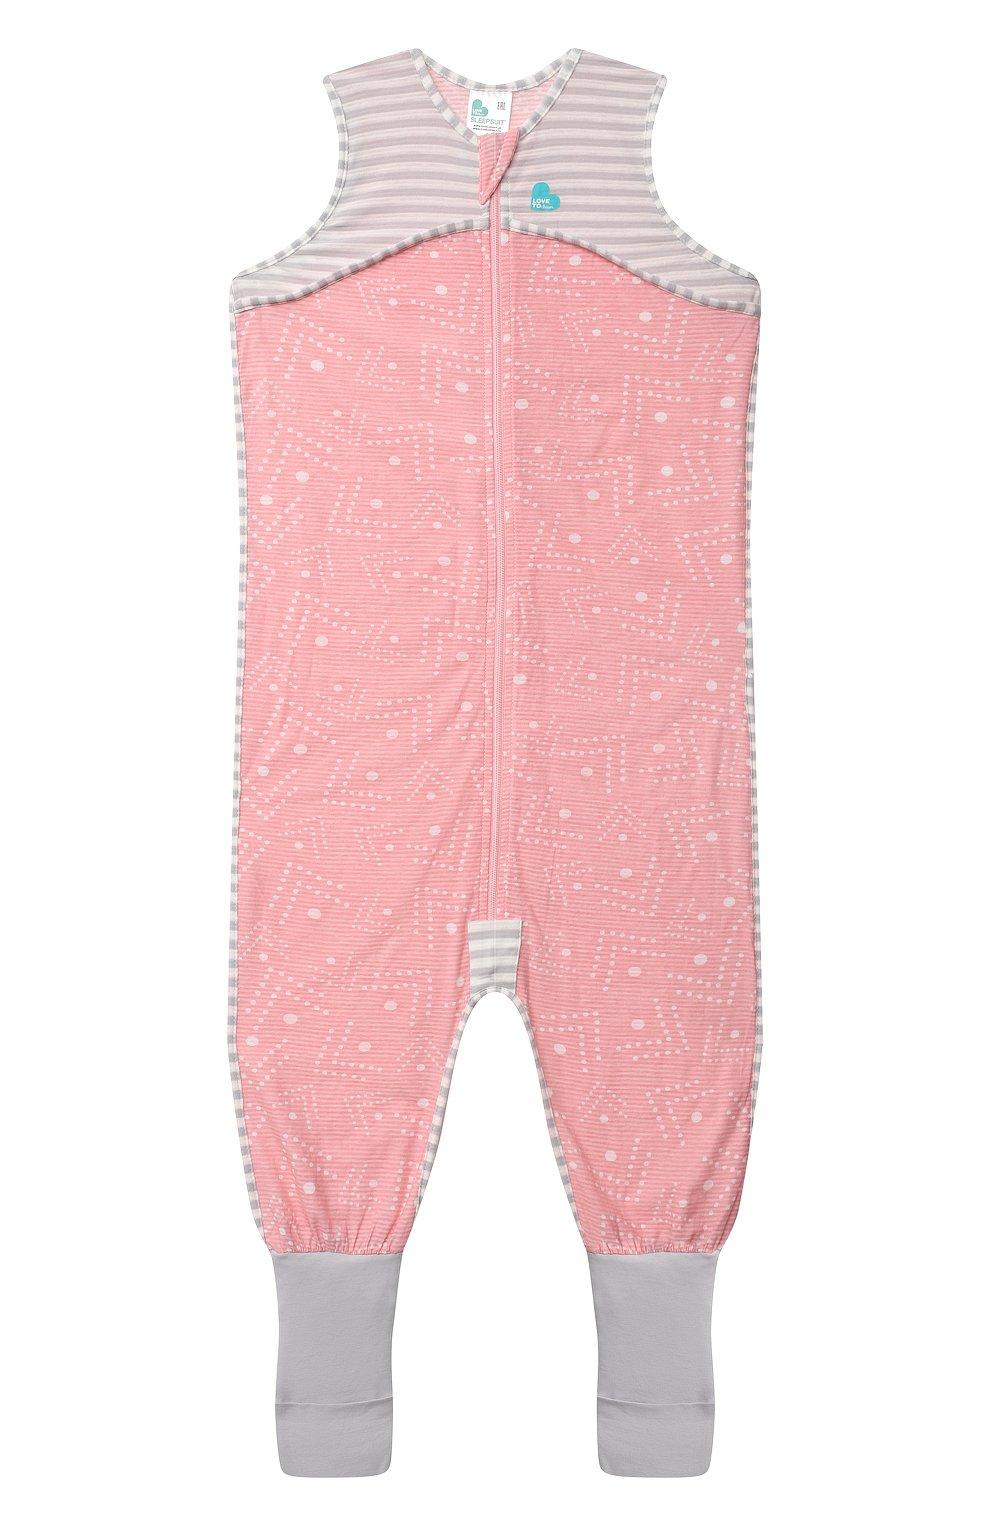 Детский хлопковый комбинезон LOVE TO DREAM розового цвета, арт. L40 16 088 PNK 24M | Фото 1